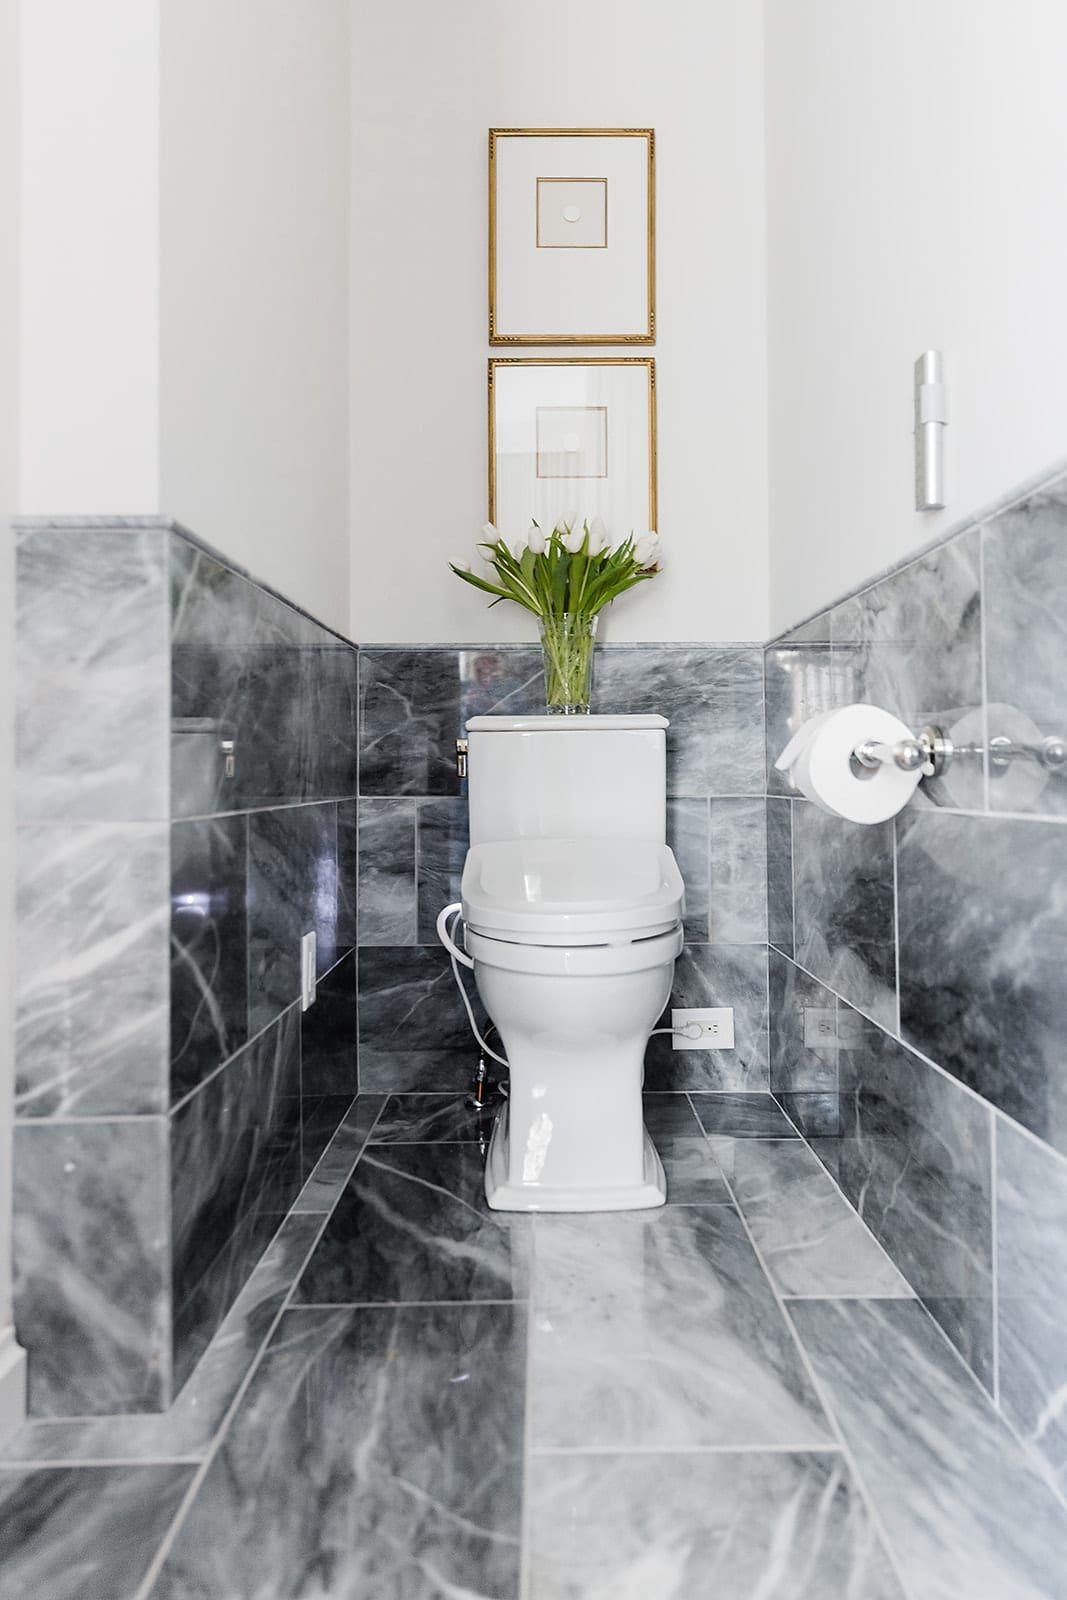 Potty Talk The Toto Toilet You Never Knew You Always Needed In 2020 Toto Toilet Toto Bidet Washlet